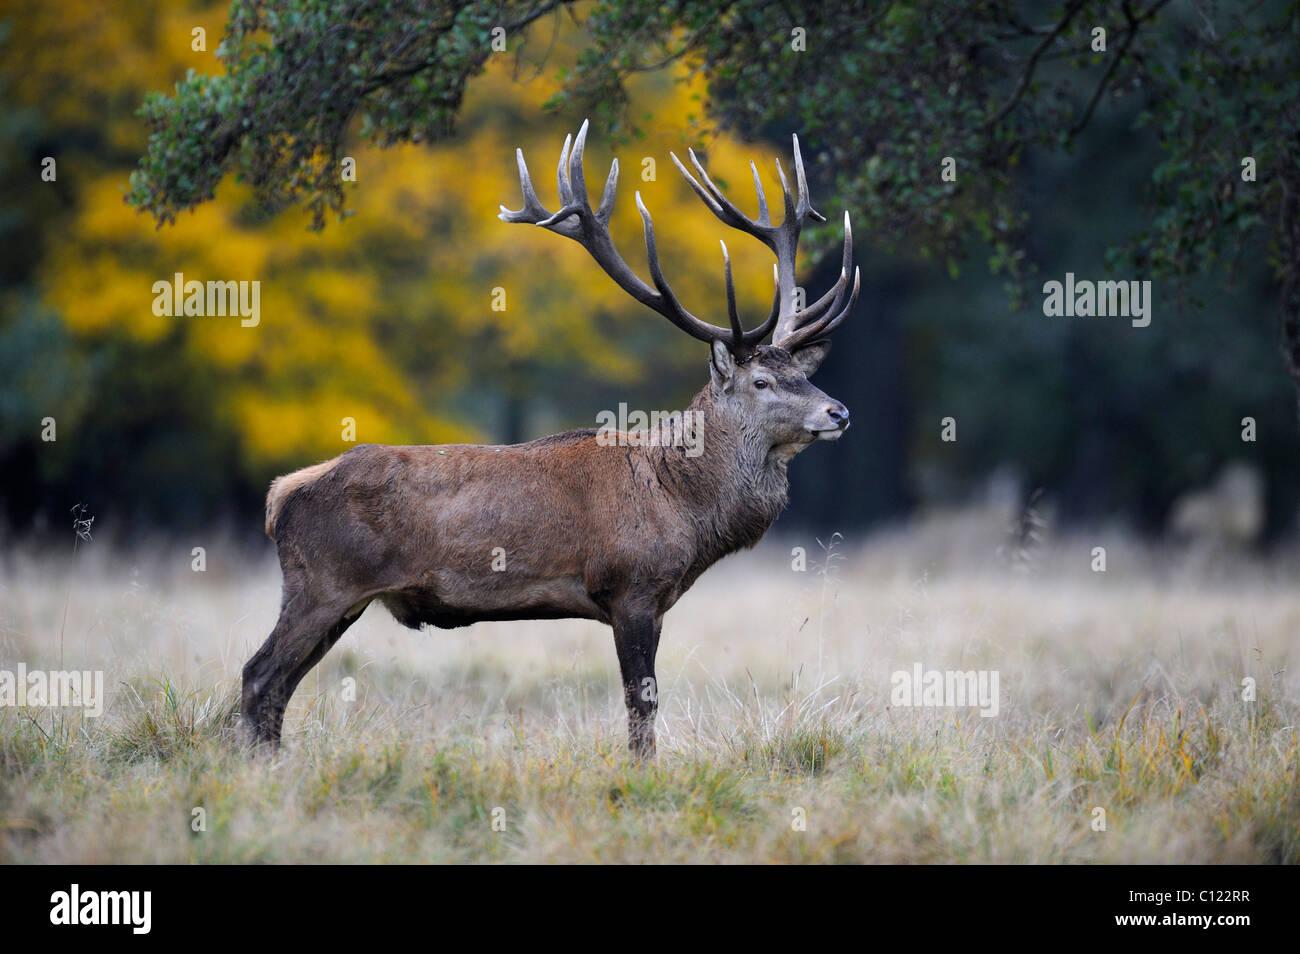 Red Deer (Cervus elaphus) stag, Jaegersborg, Denmark, Scandinavia, Europe - Stock Image